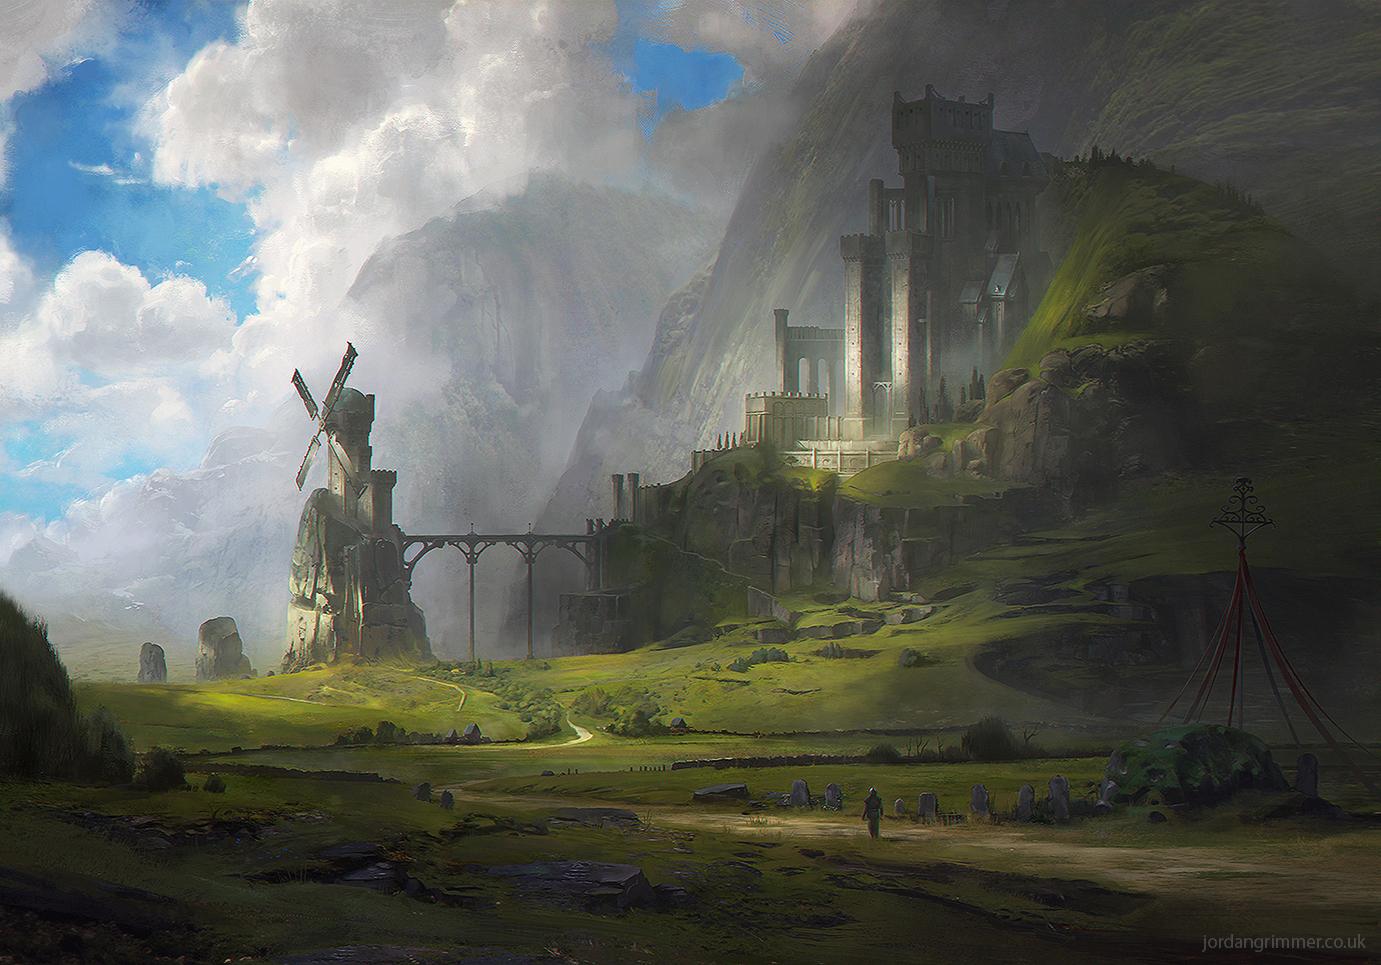 Ventus Castle by jordangrimmer